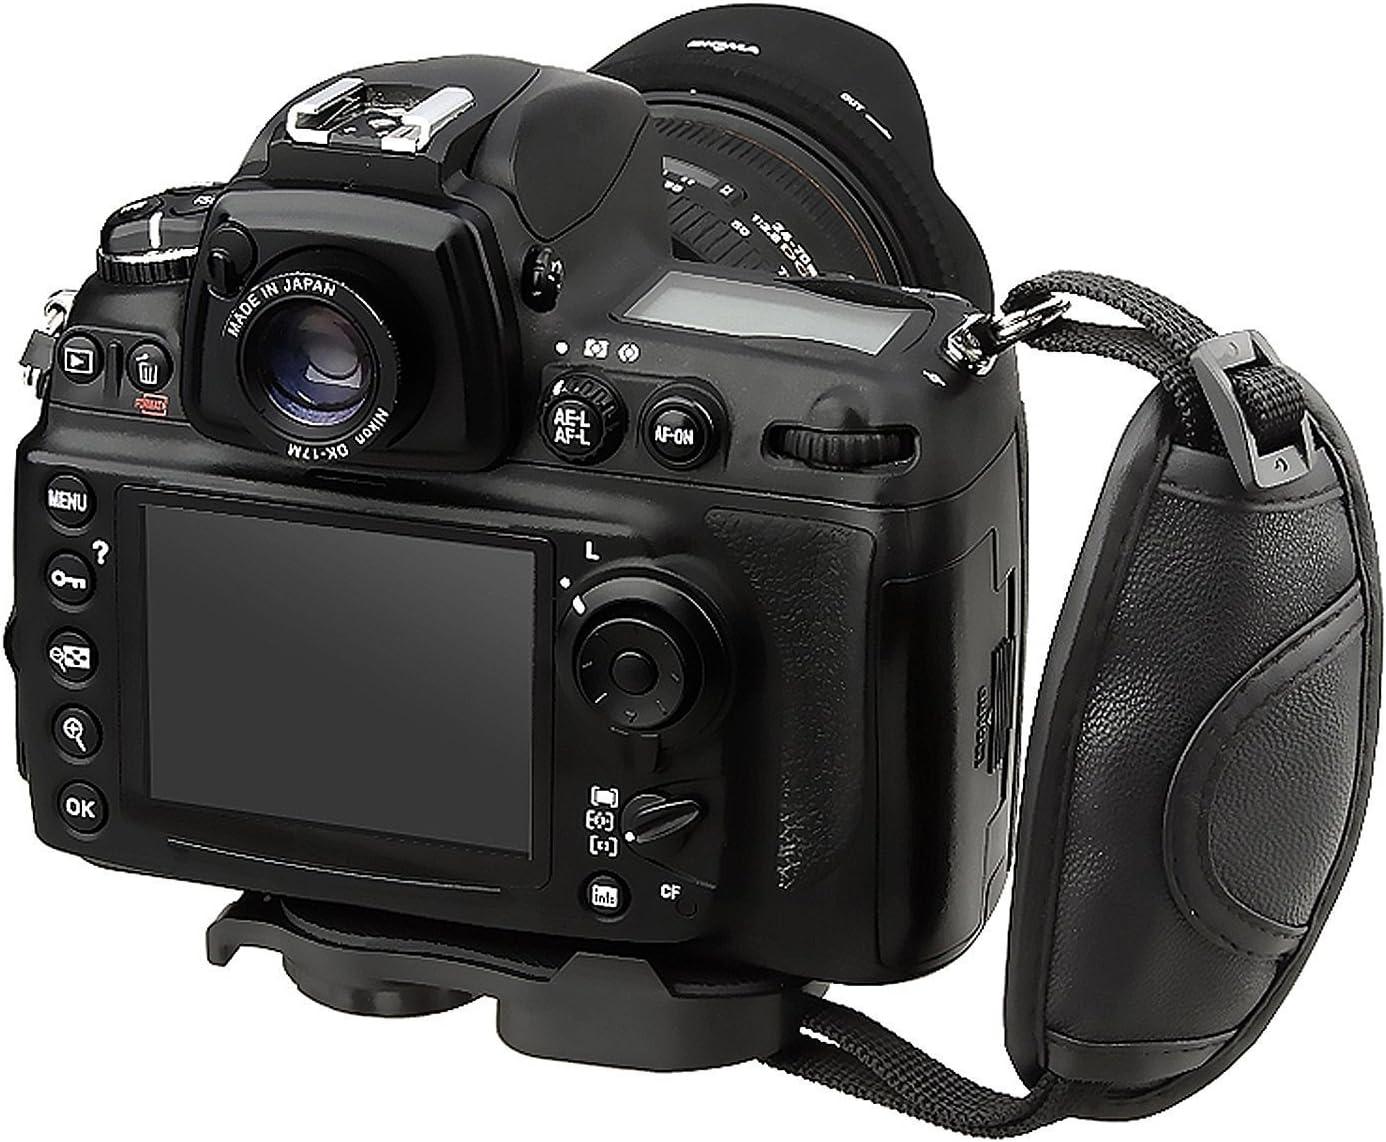 Prost - Correa de mano para Canon EOS Ti T4i T3i 5 Nikon D7200 ...